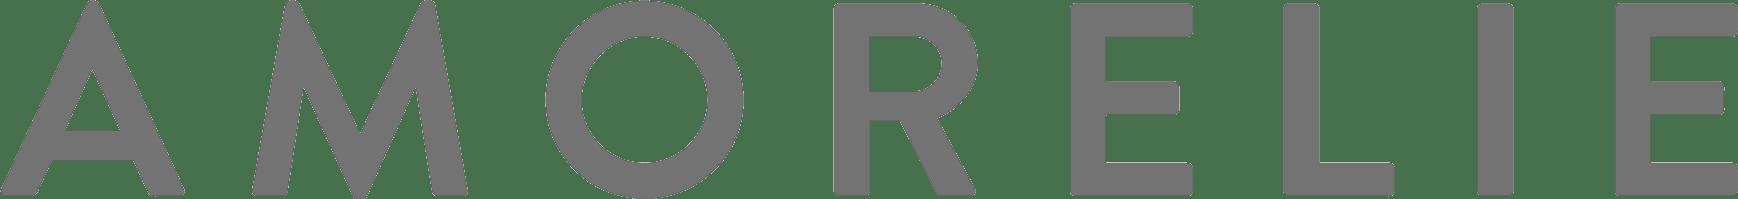 Amorelie logo grey 6b705c.png?ixlib=rb 1.1